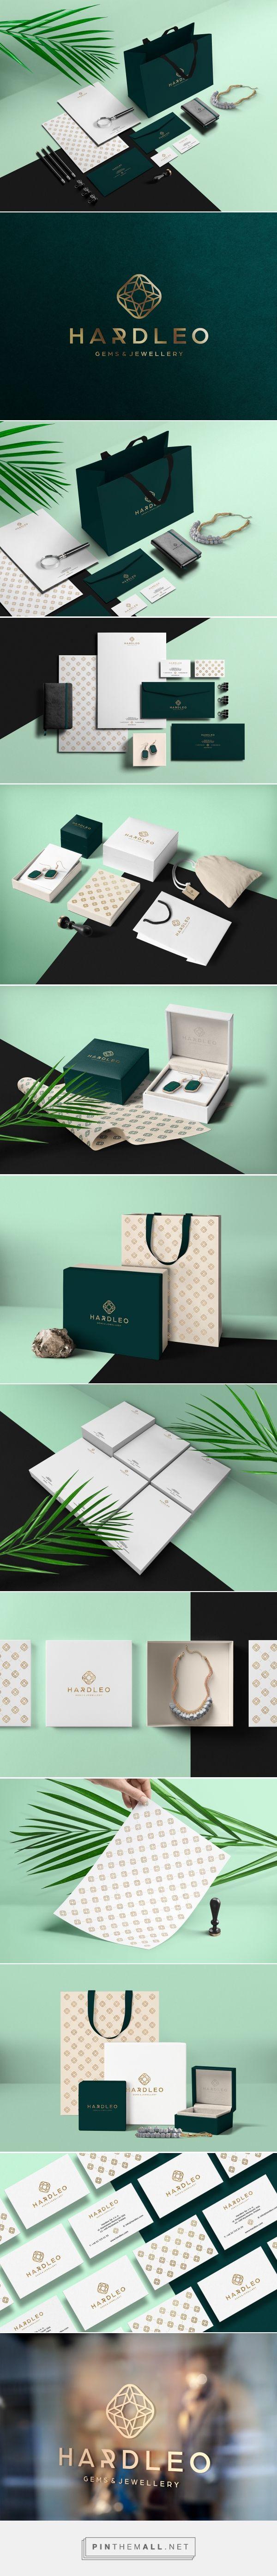 Hardleo Gems & Jewellery Branding by Dawid Cmok | Fivestar Branding Agency – Design and Branding Agency & Curated Inspiration Gallery